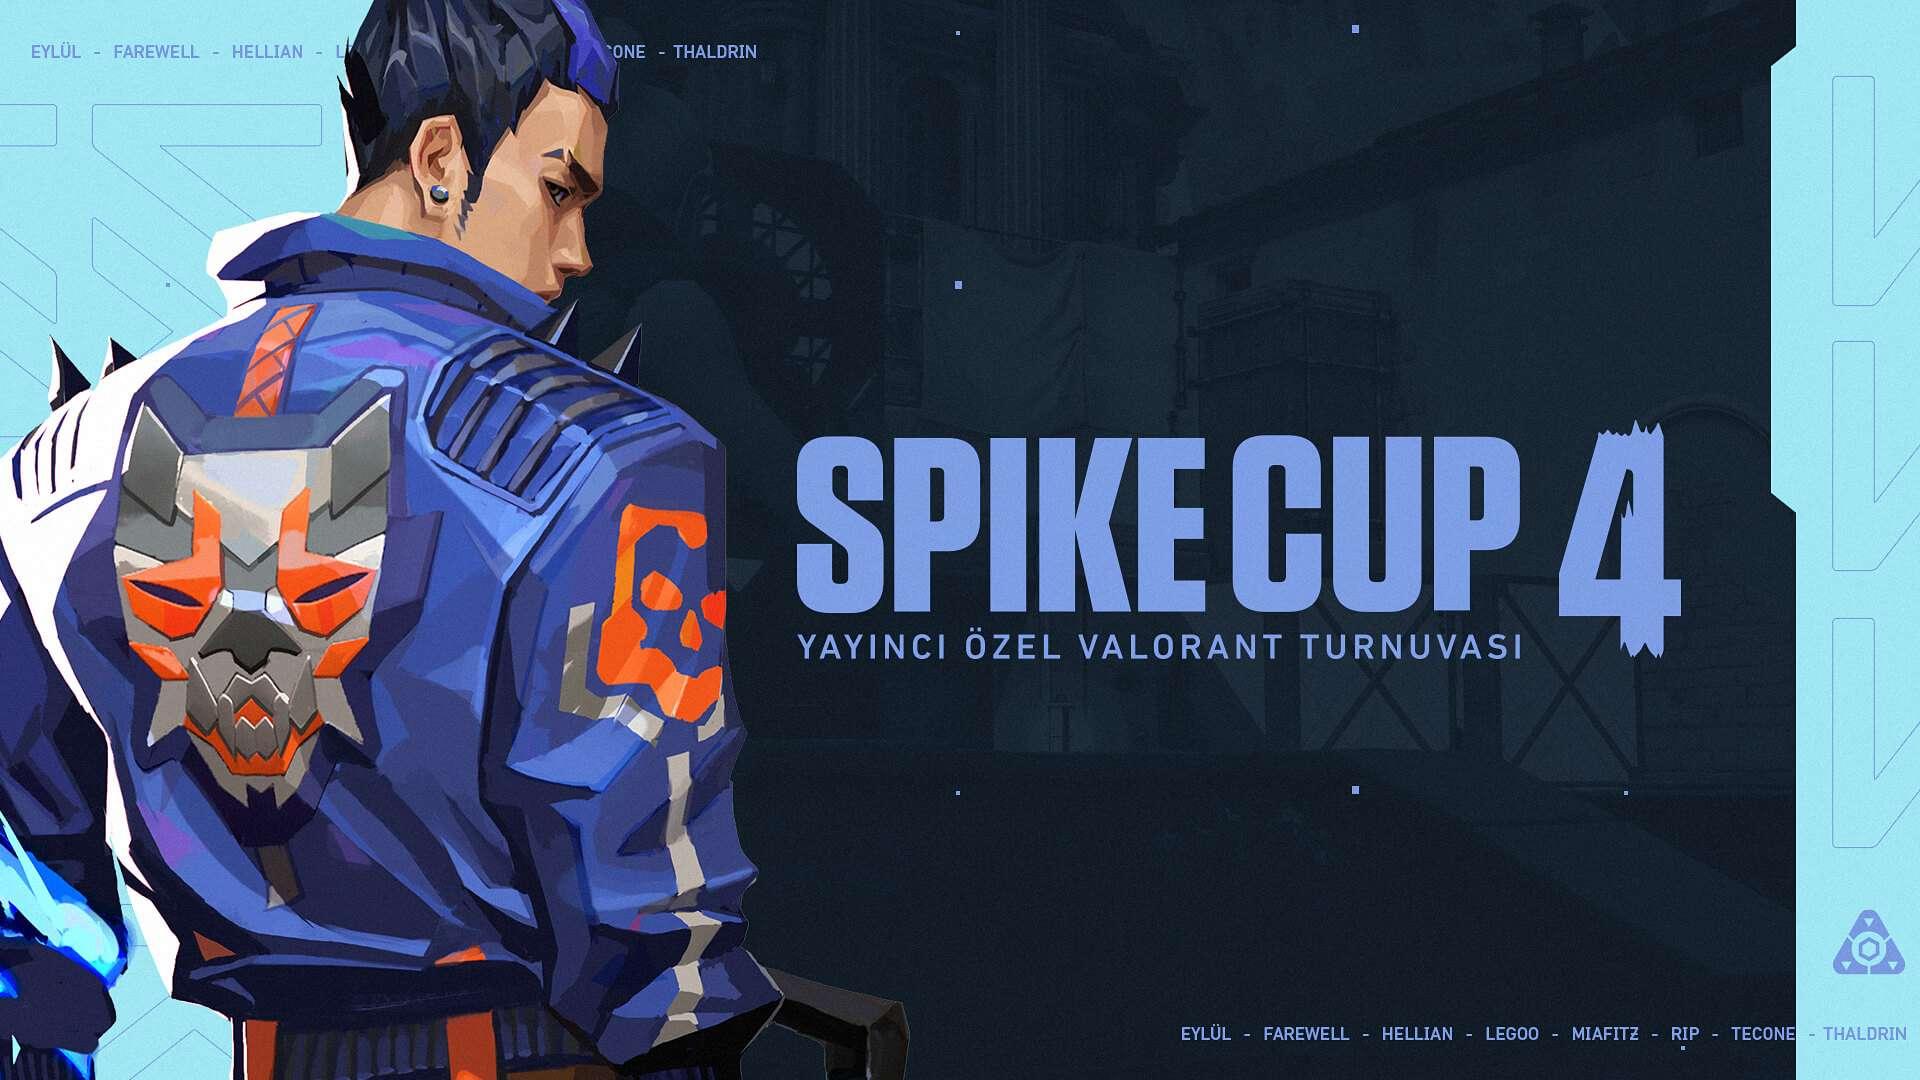 Spike Cup 4